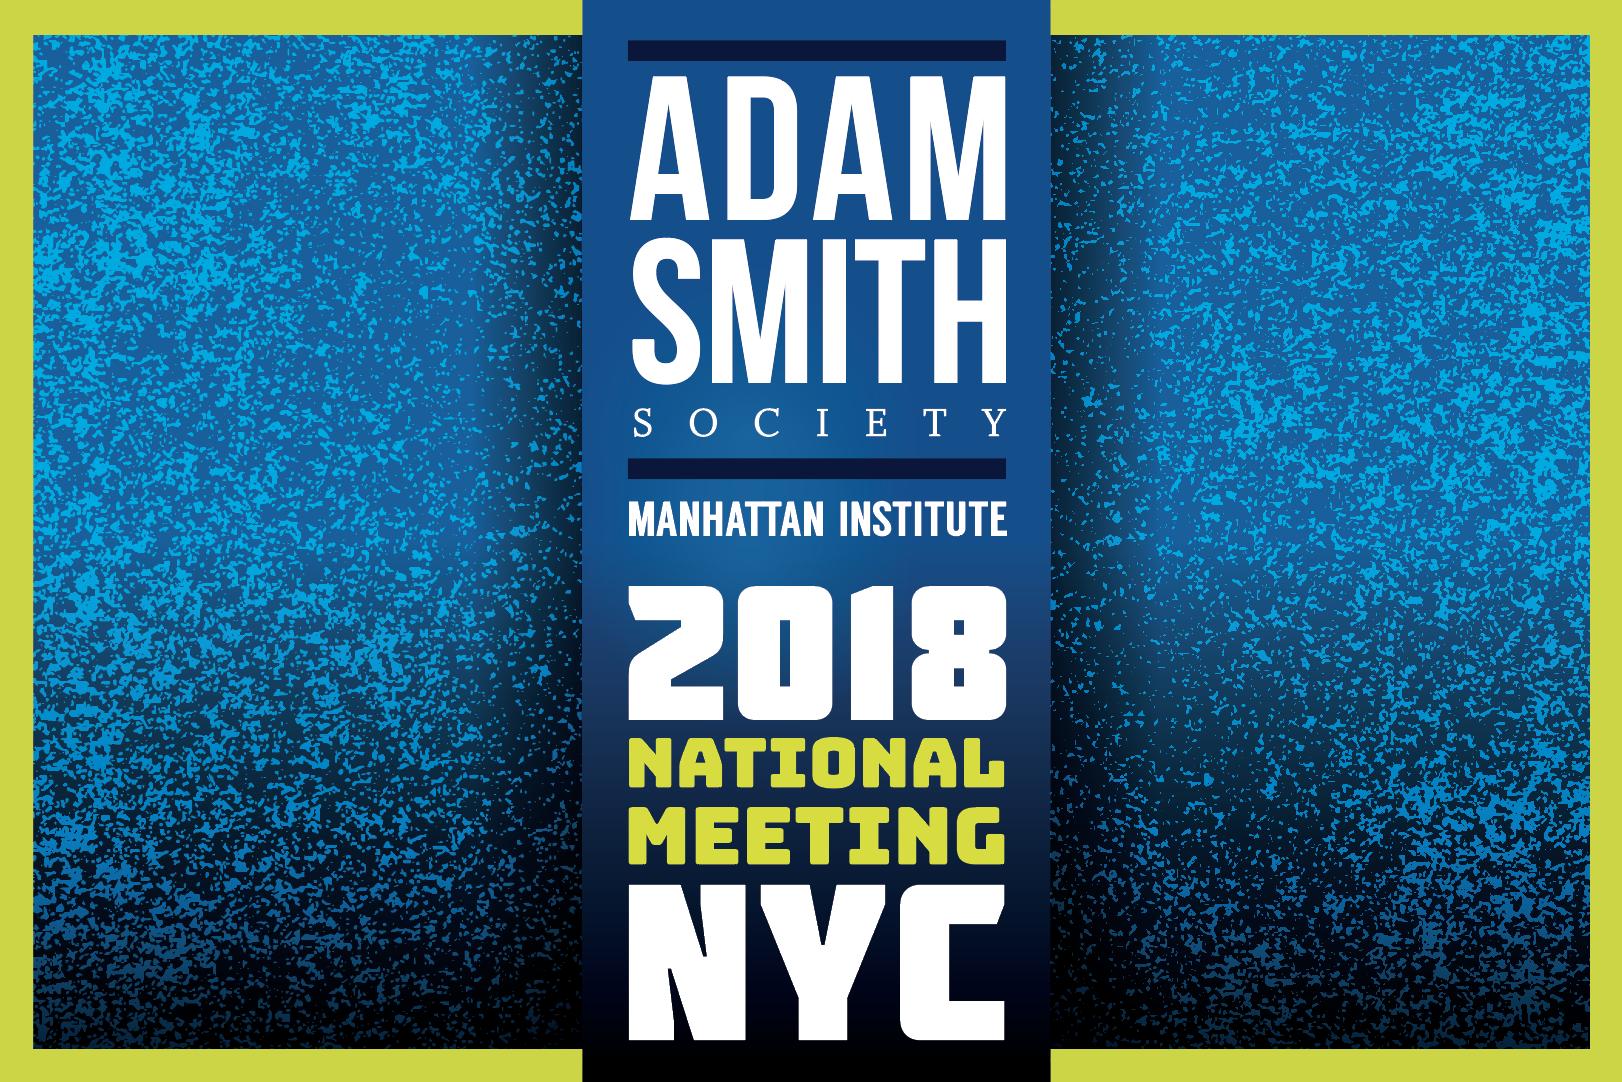 National Meeting 2018